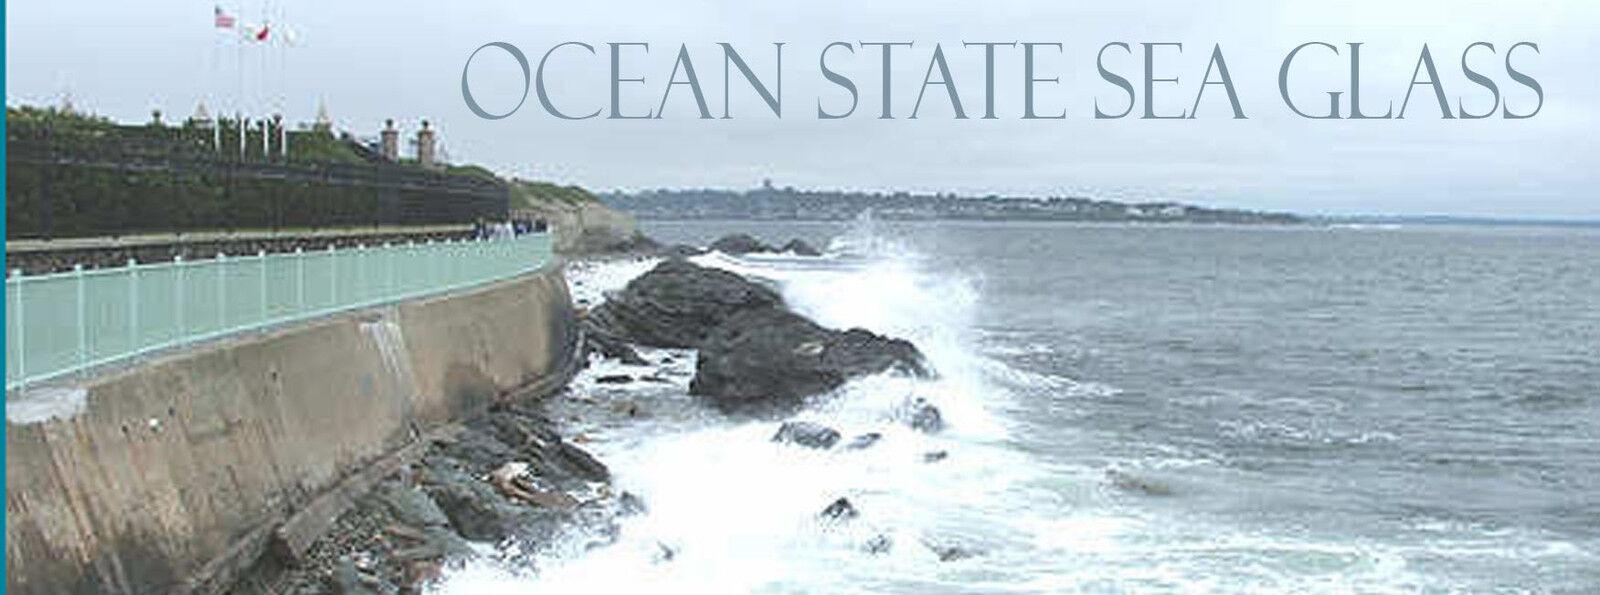 oceanstateseaglass